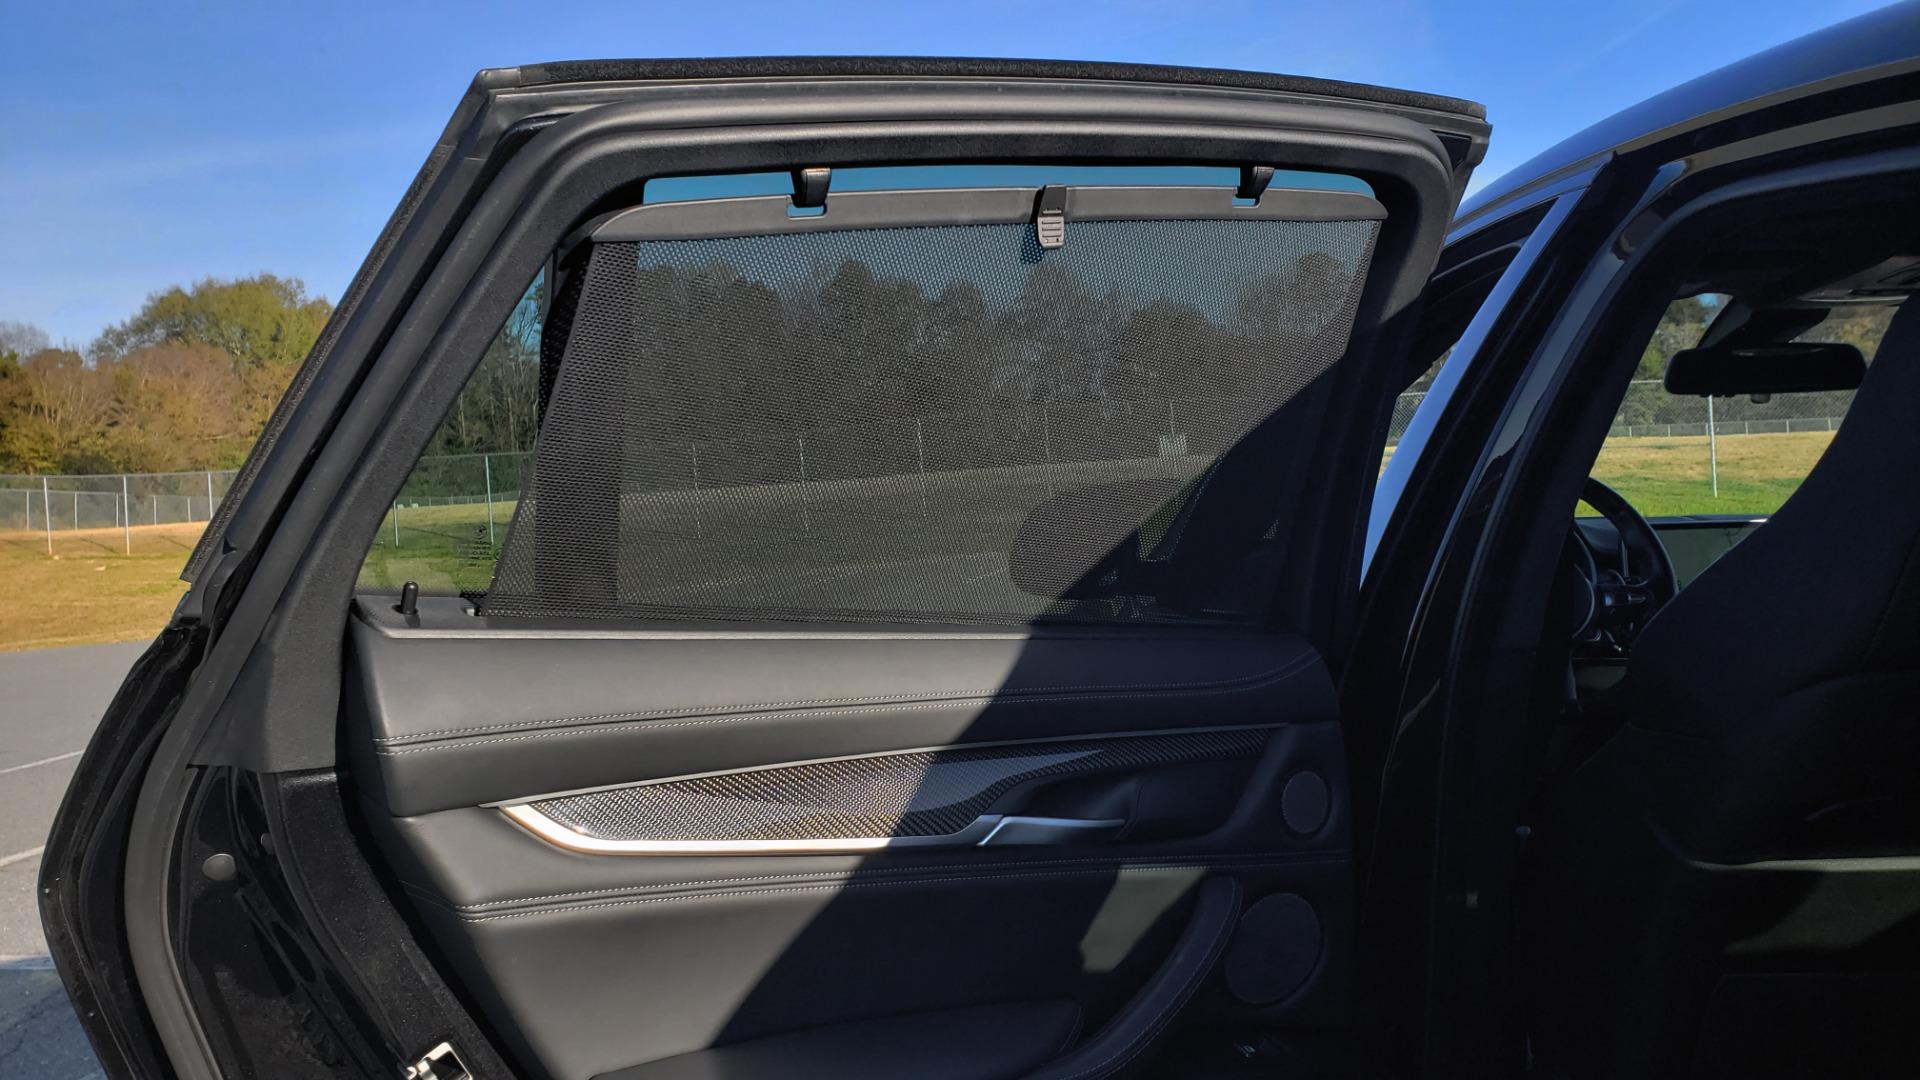 Used 2016 BMW X6 M EXEC PKG / DRVR ASST / NAV / SUNROOF / BLIND SPOT / REARVIEW for sale Sold at Formula Imports in Charlotte NC 28227 61